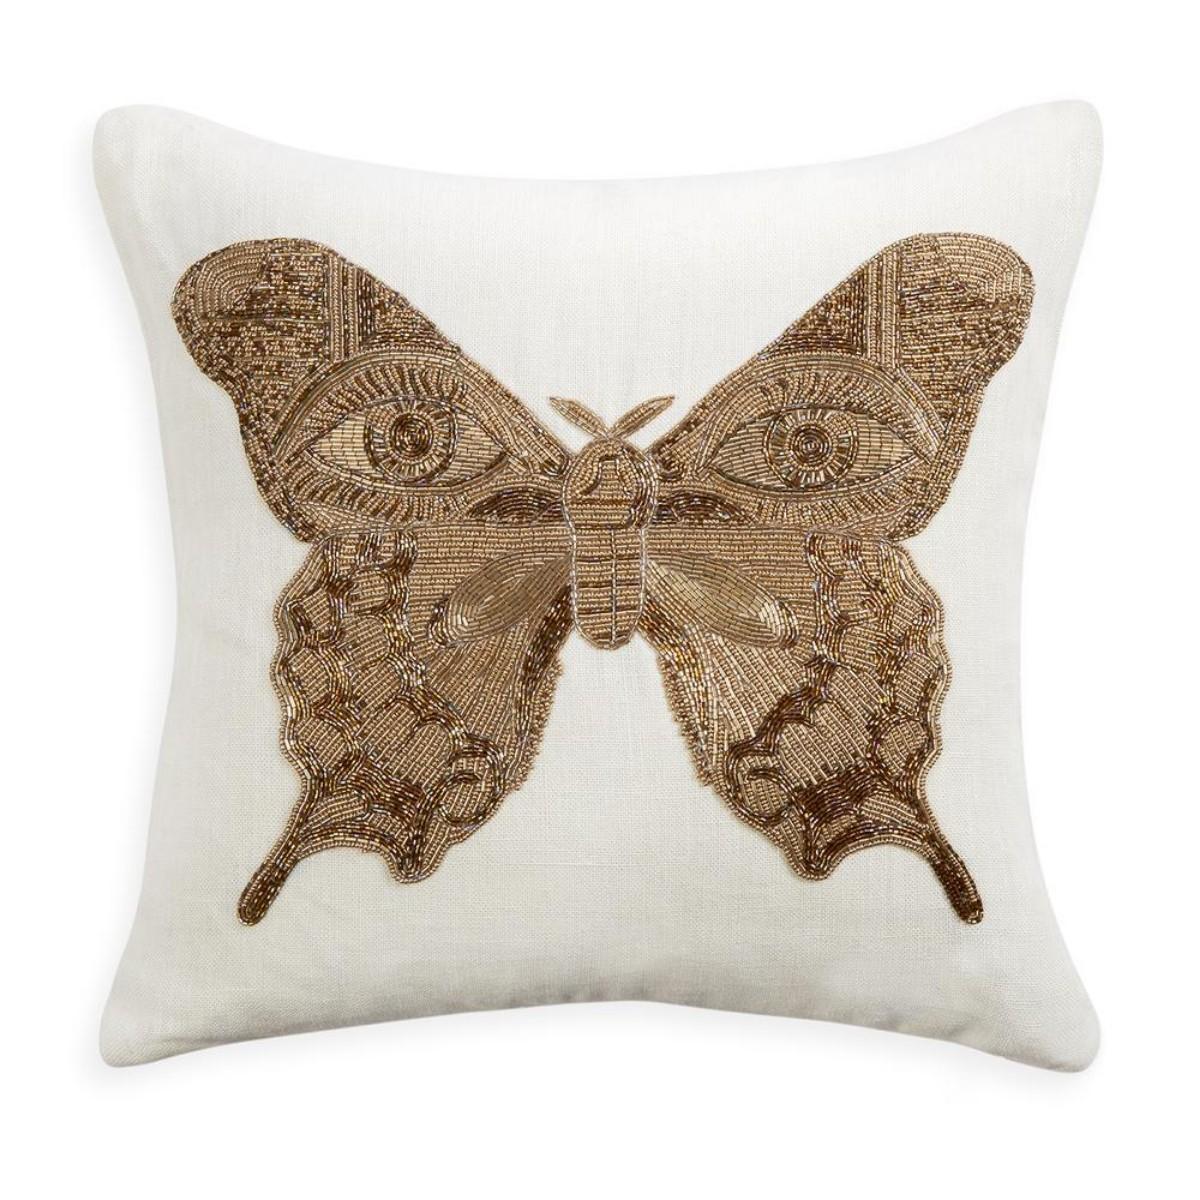 Jonathan Adler I Muse Butterfly Throw Pillow